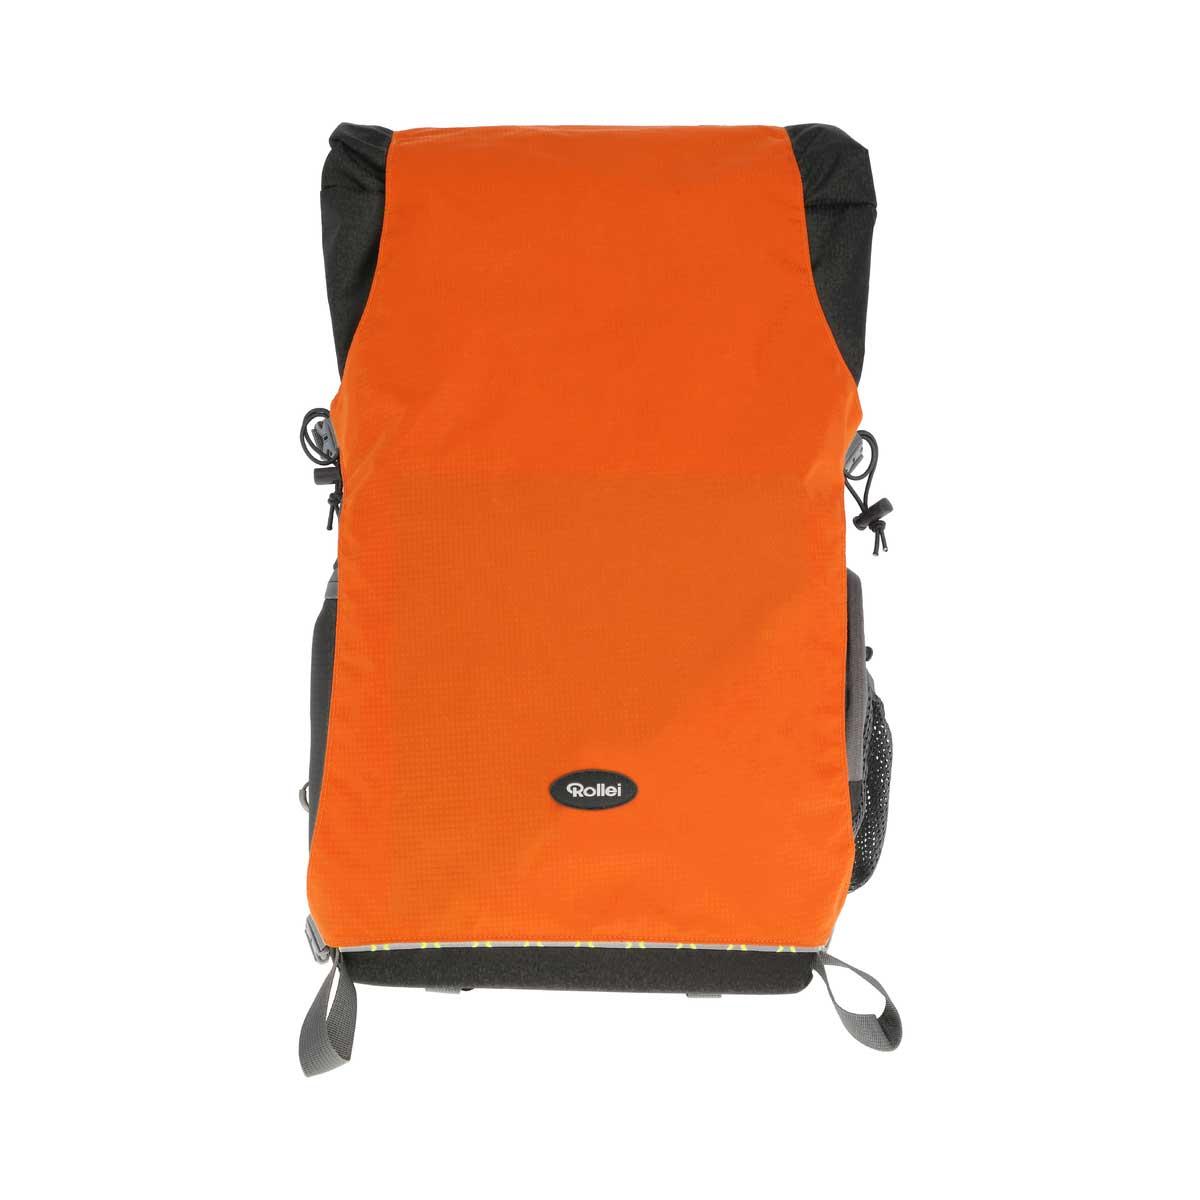 Rollei Traveler Backpack Canyon L 35L Sunrise Grey/Orange